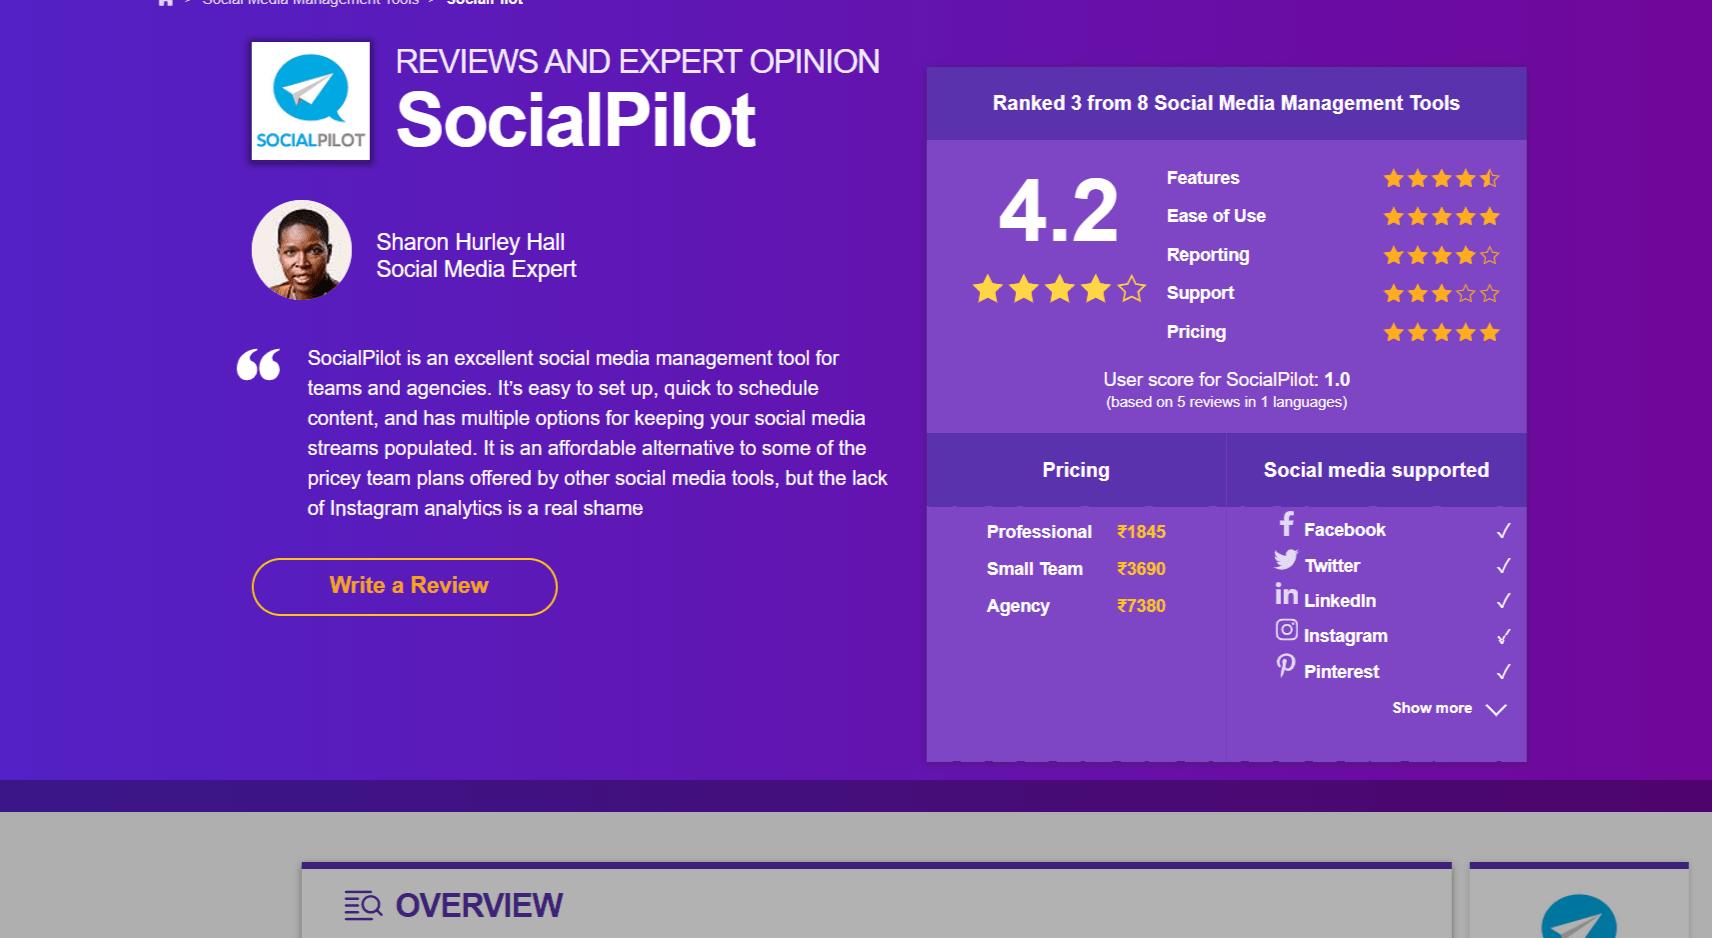 SocialPilot Review- Testimonials